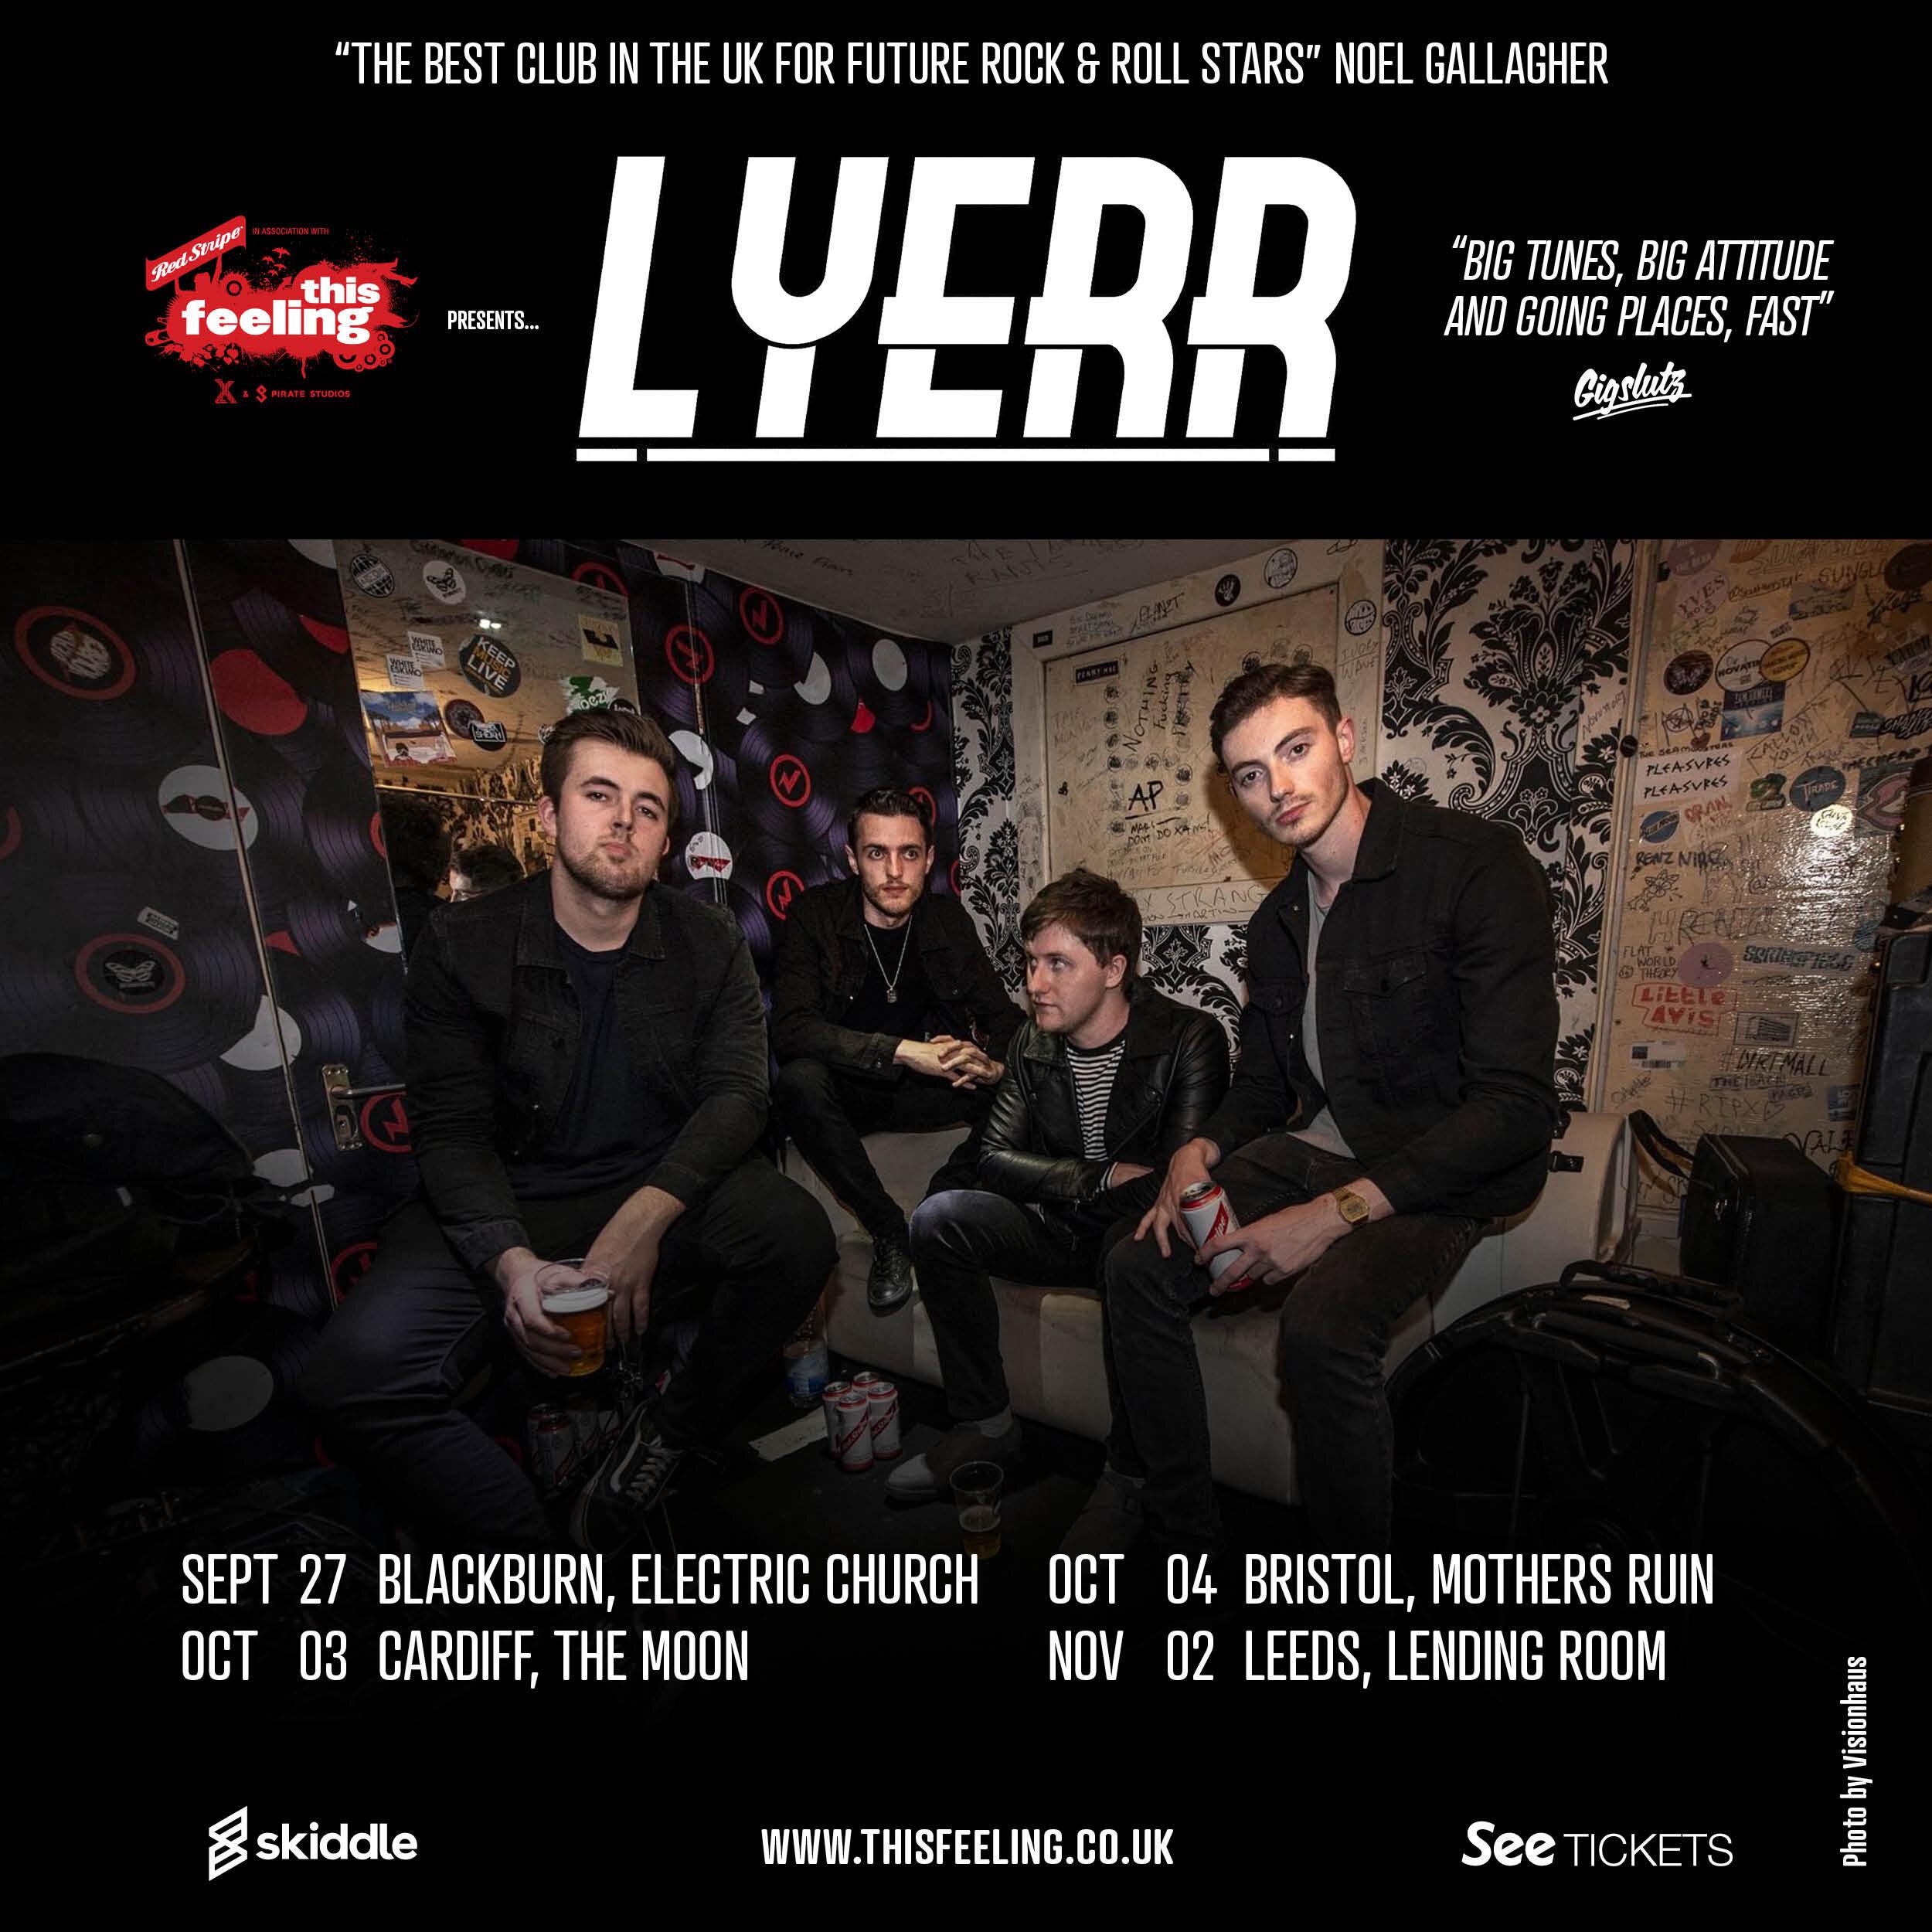 lyerr tour poster.jpg